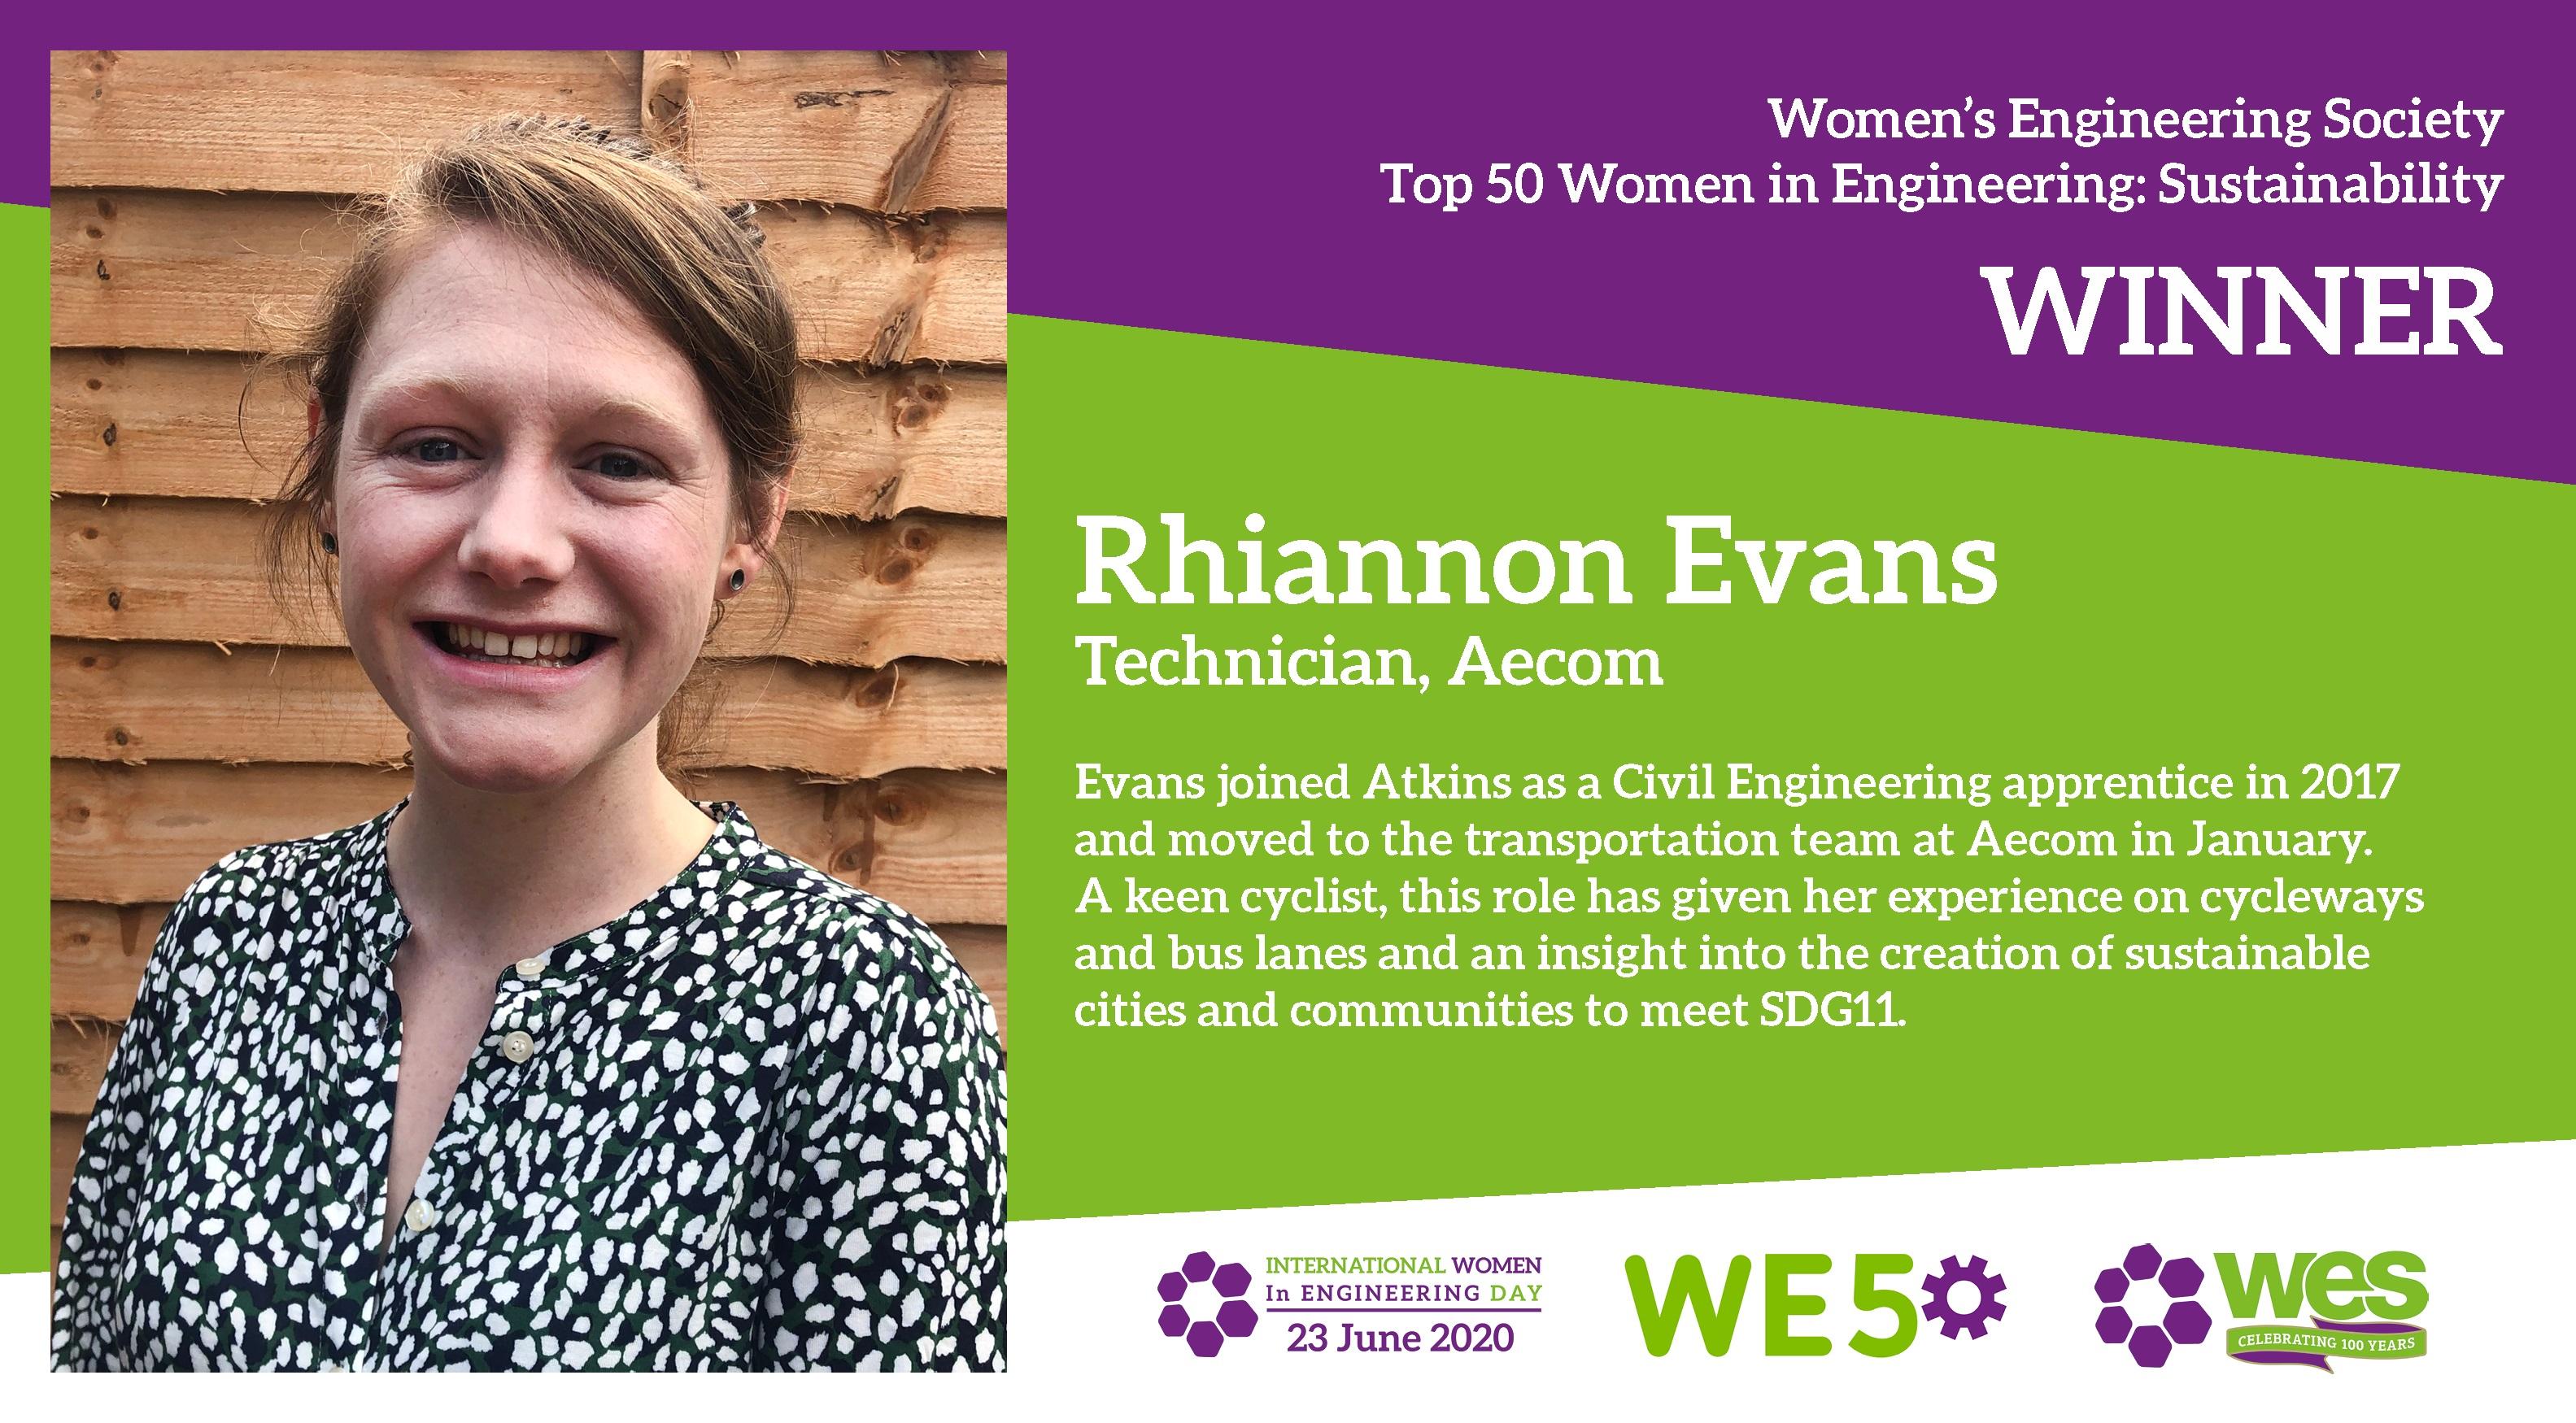 Rhiannon Evans AECOM technician